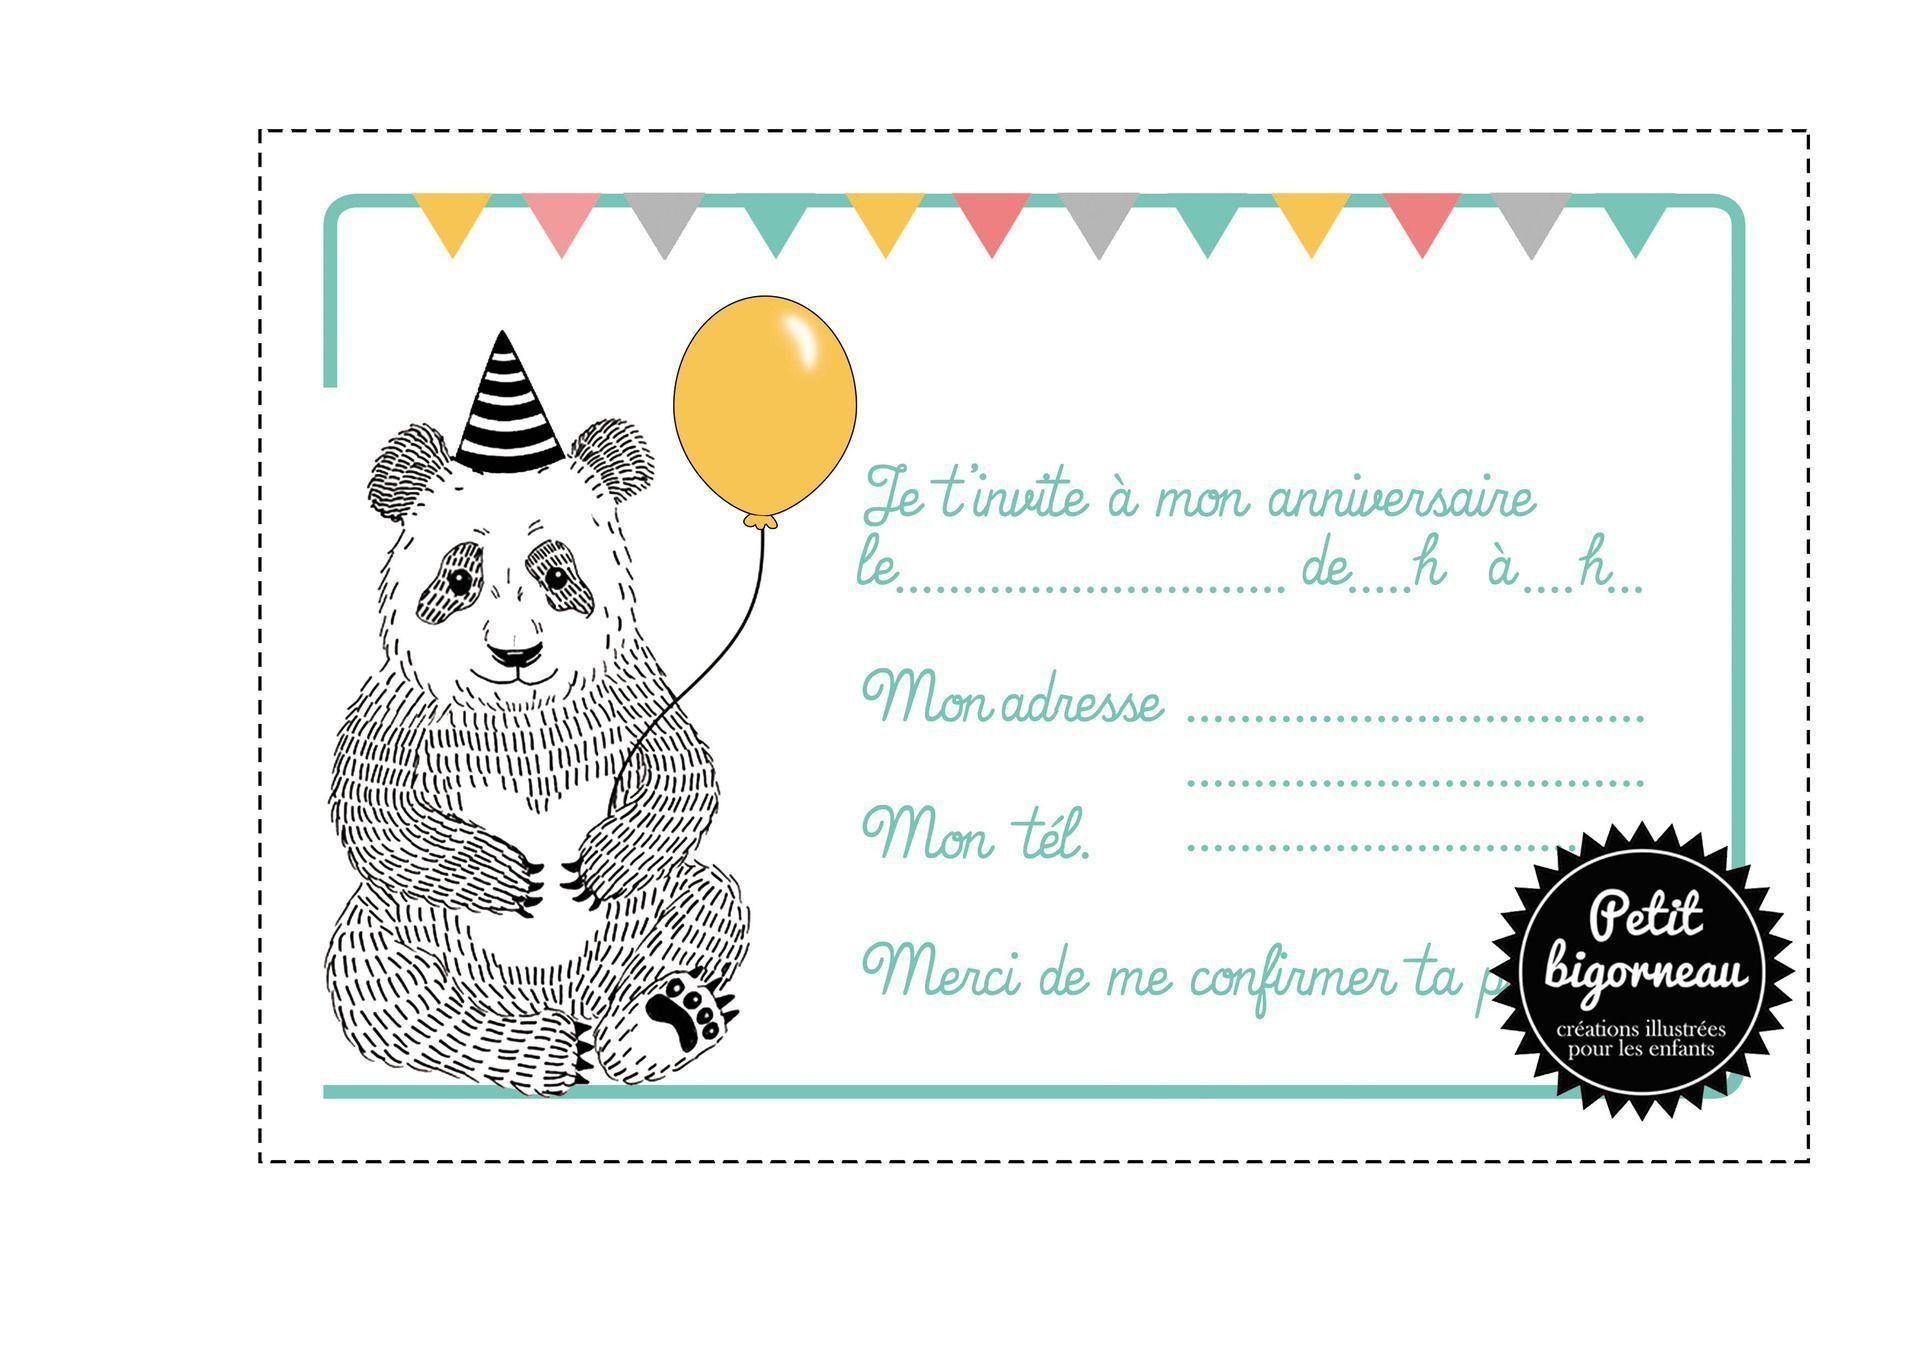 Fresh Invitation 10 Ans De Mariage Humour Invitations Party Time Carton